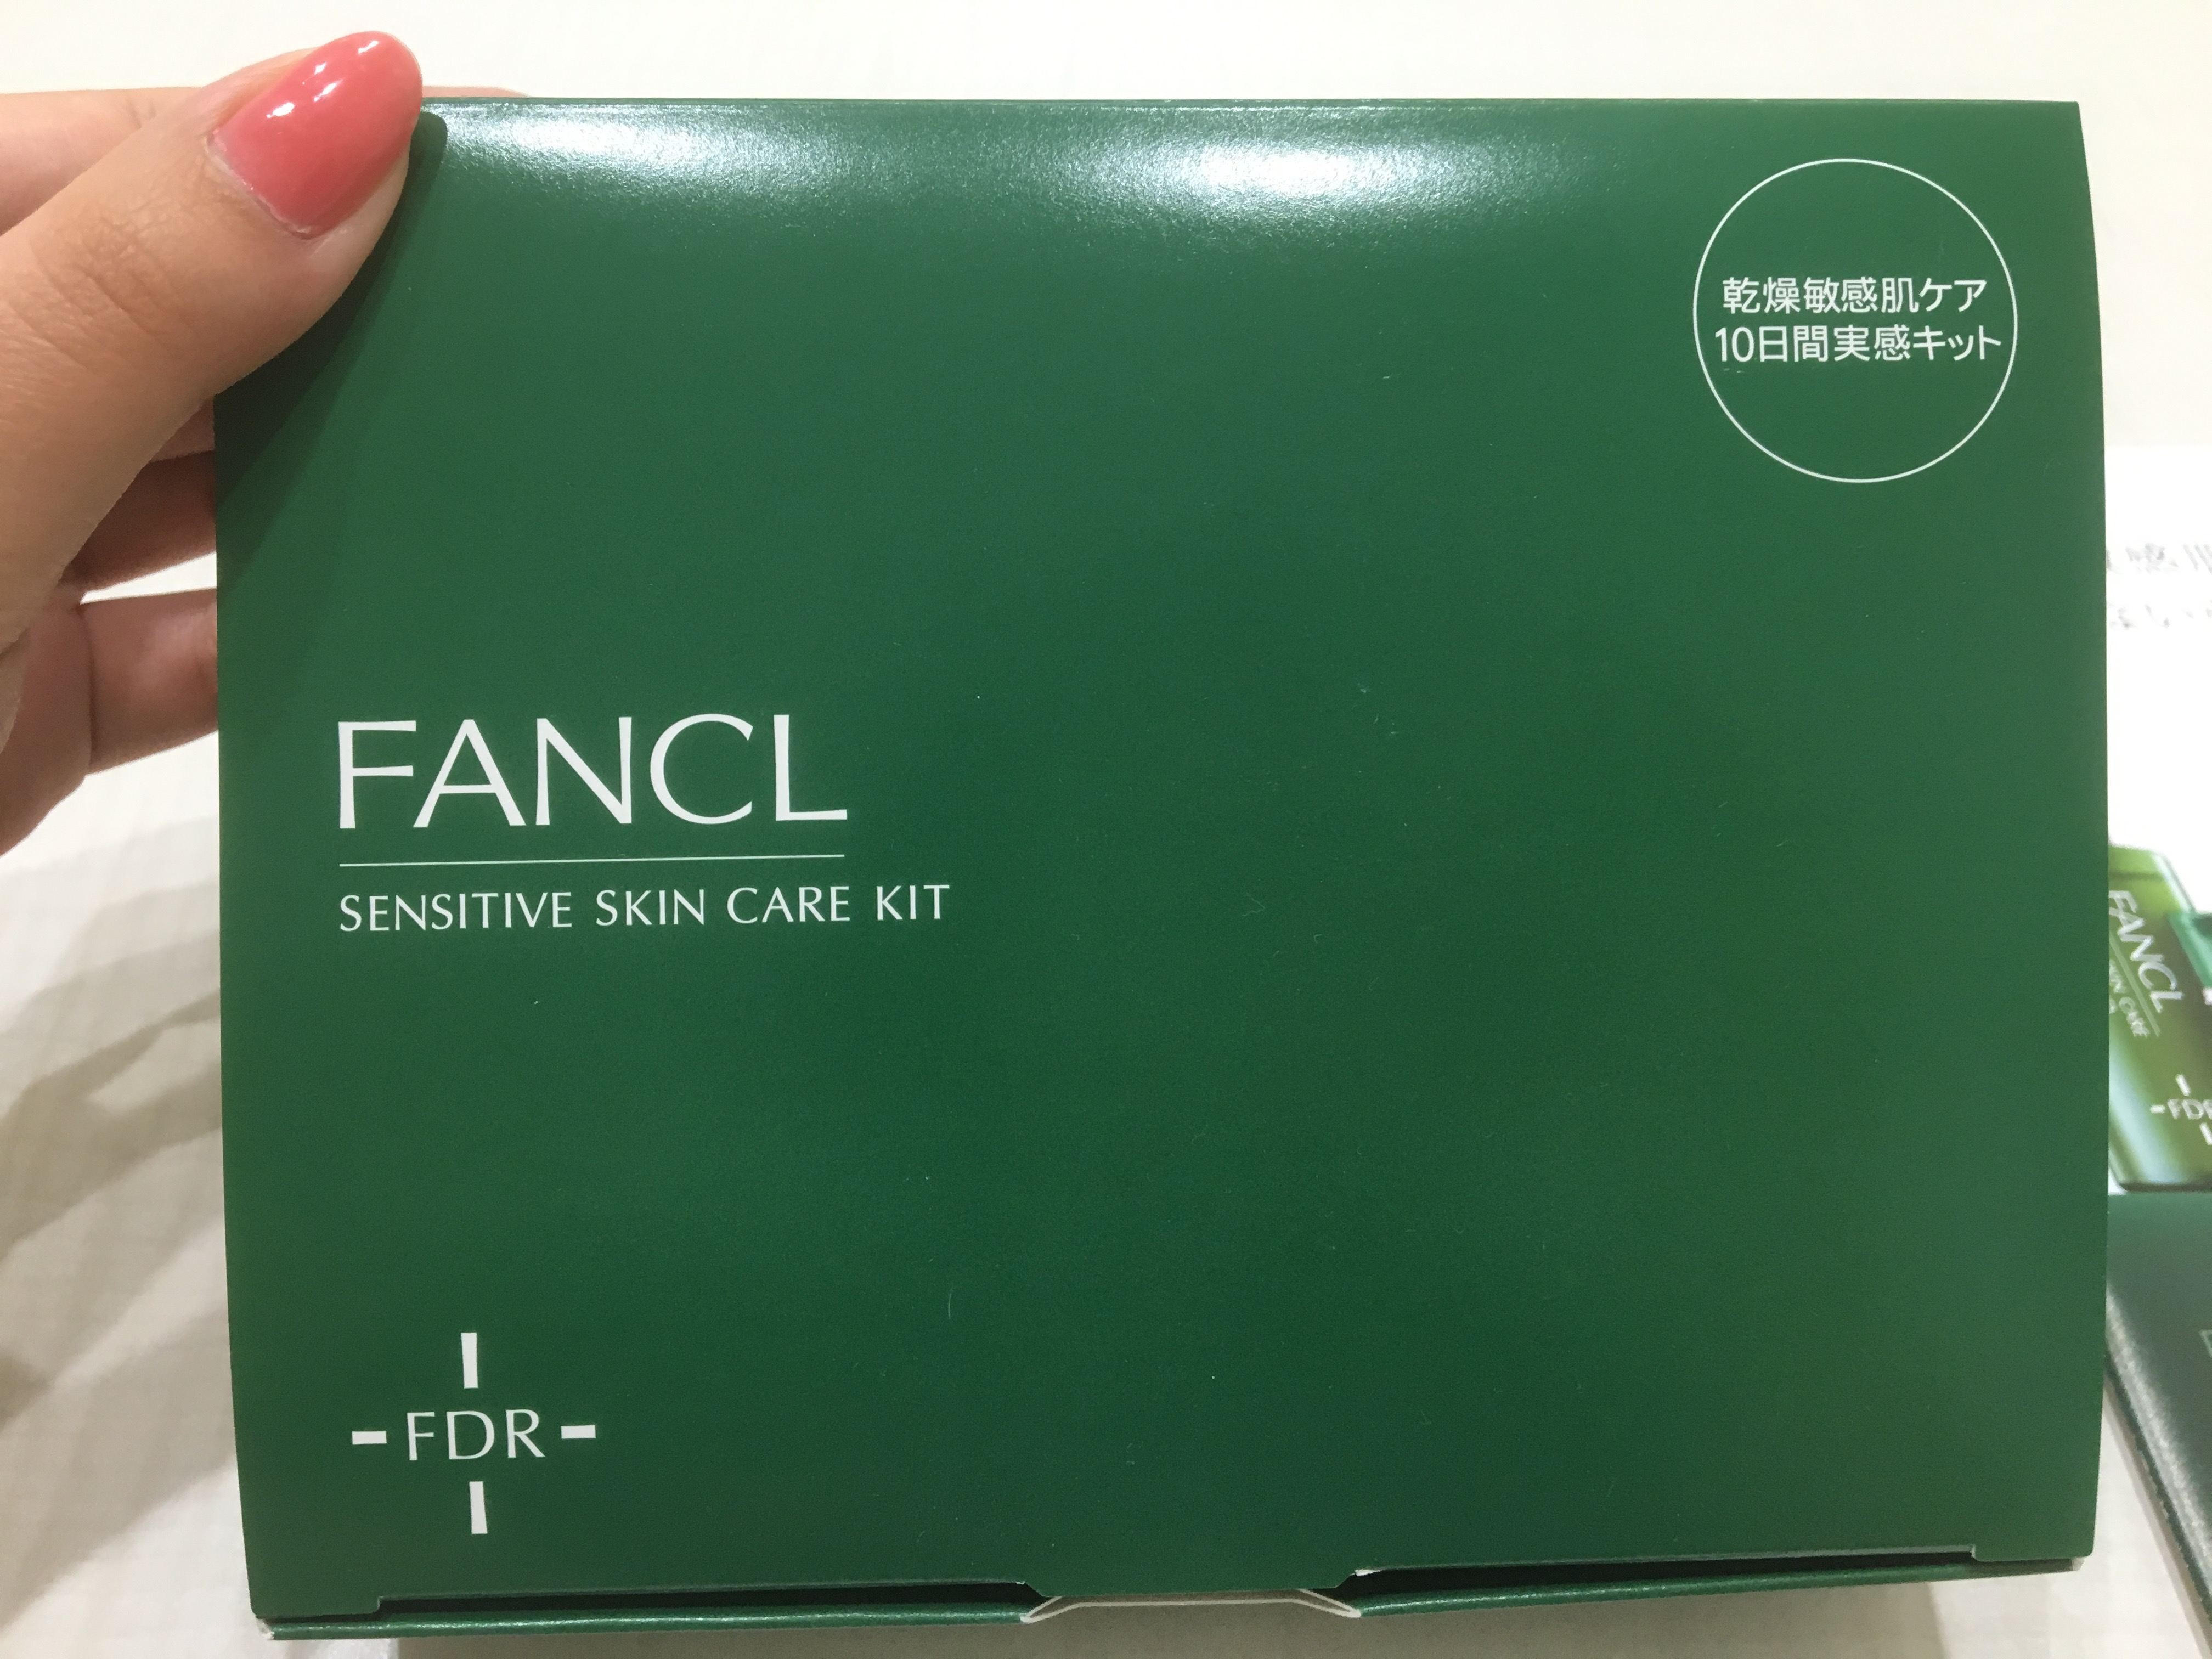 FANCL トライアルキット 敏感肌 乾燥肌 口コミ 効果